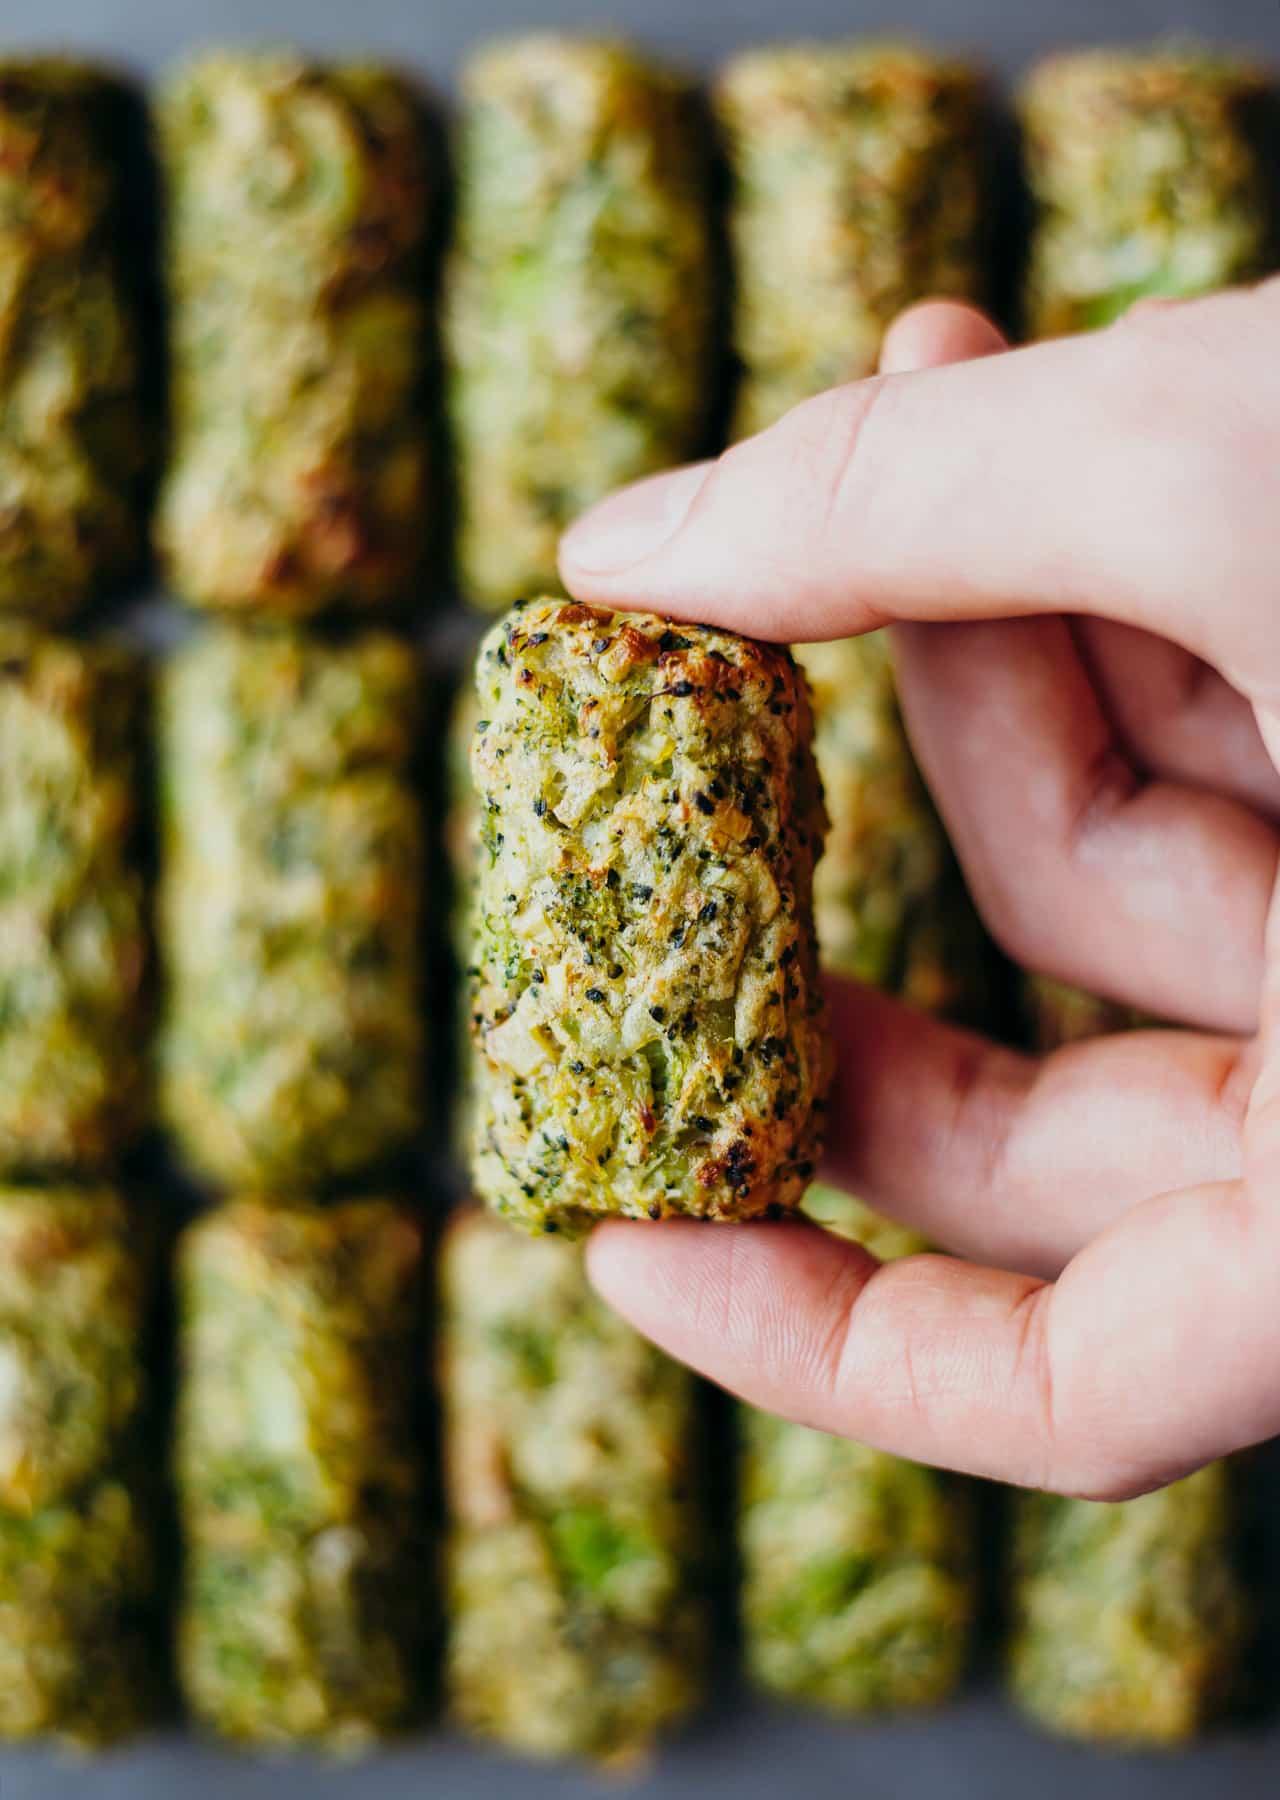 Low Waste Broccoli Tater Tots Vegan Recipe